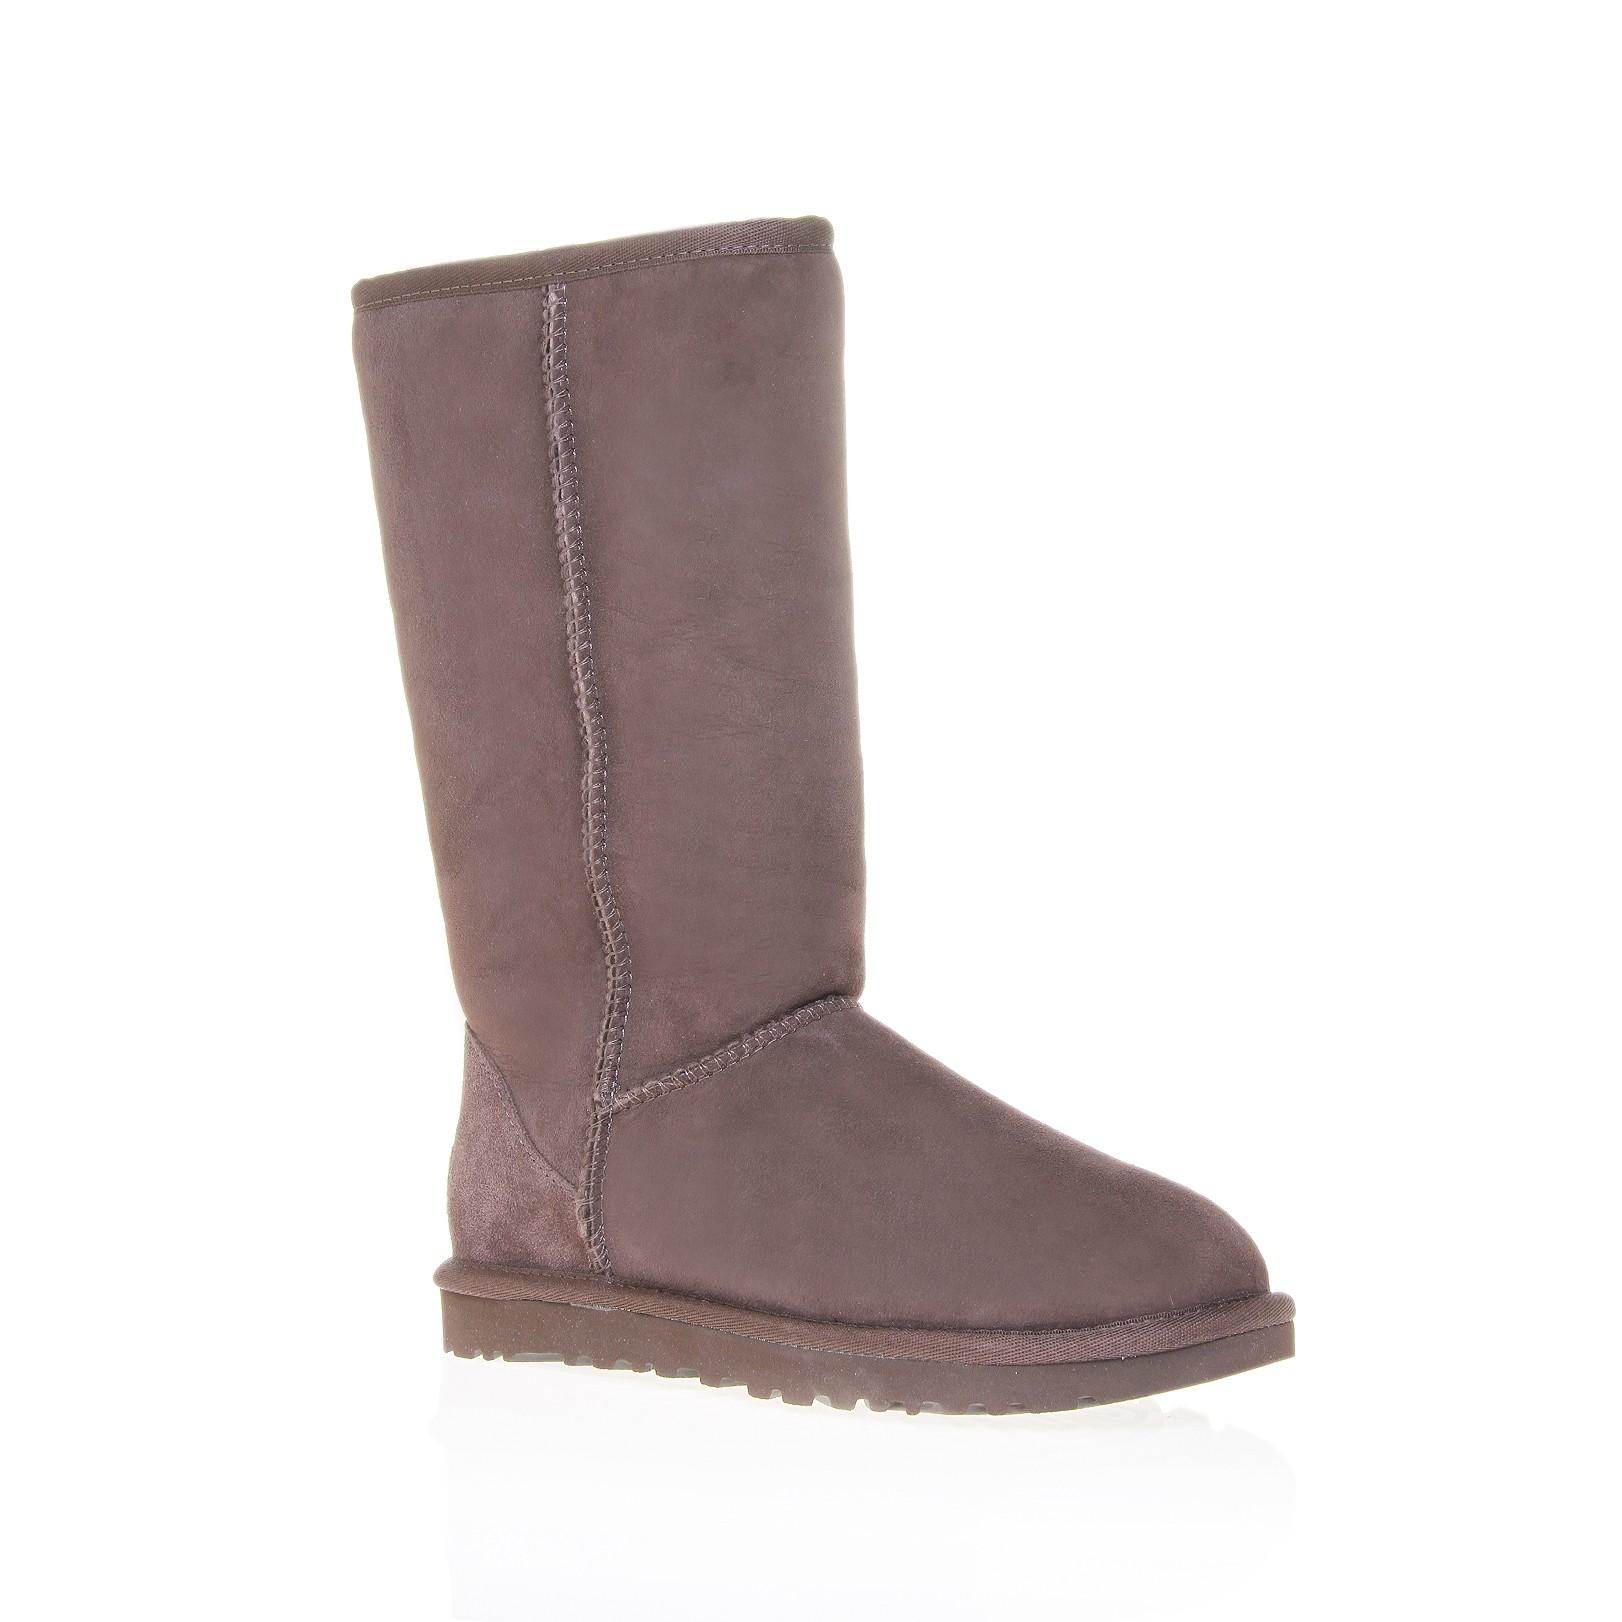 kurt geiger chocolate brown flat suede boots